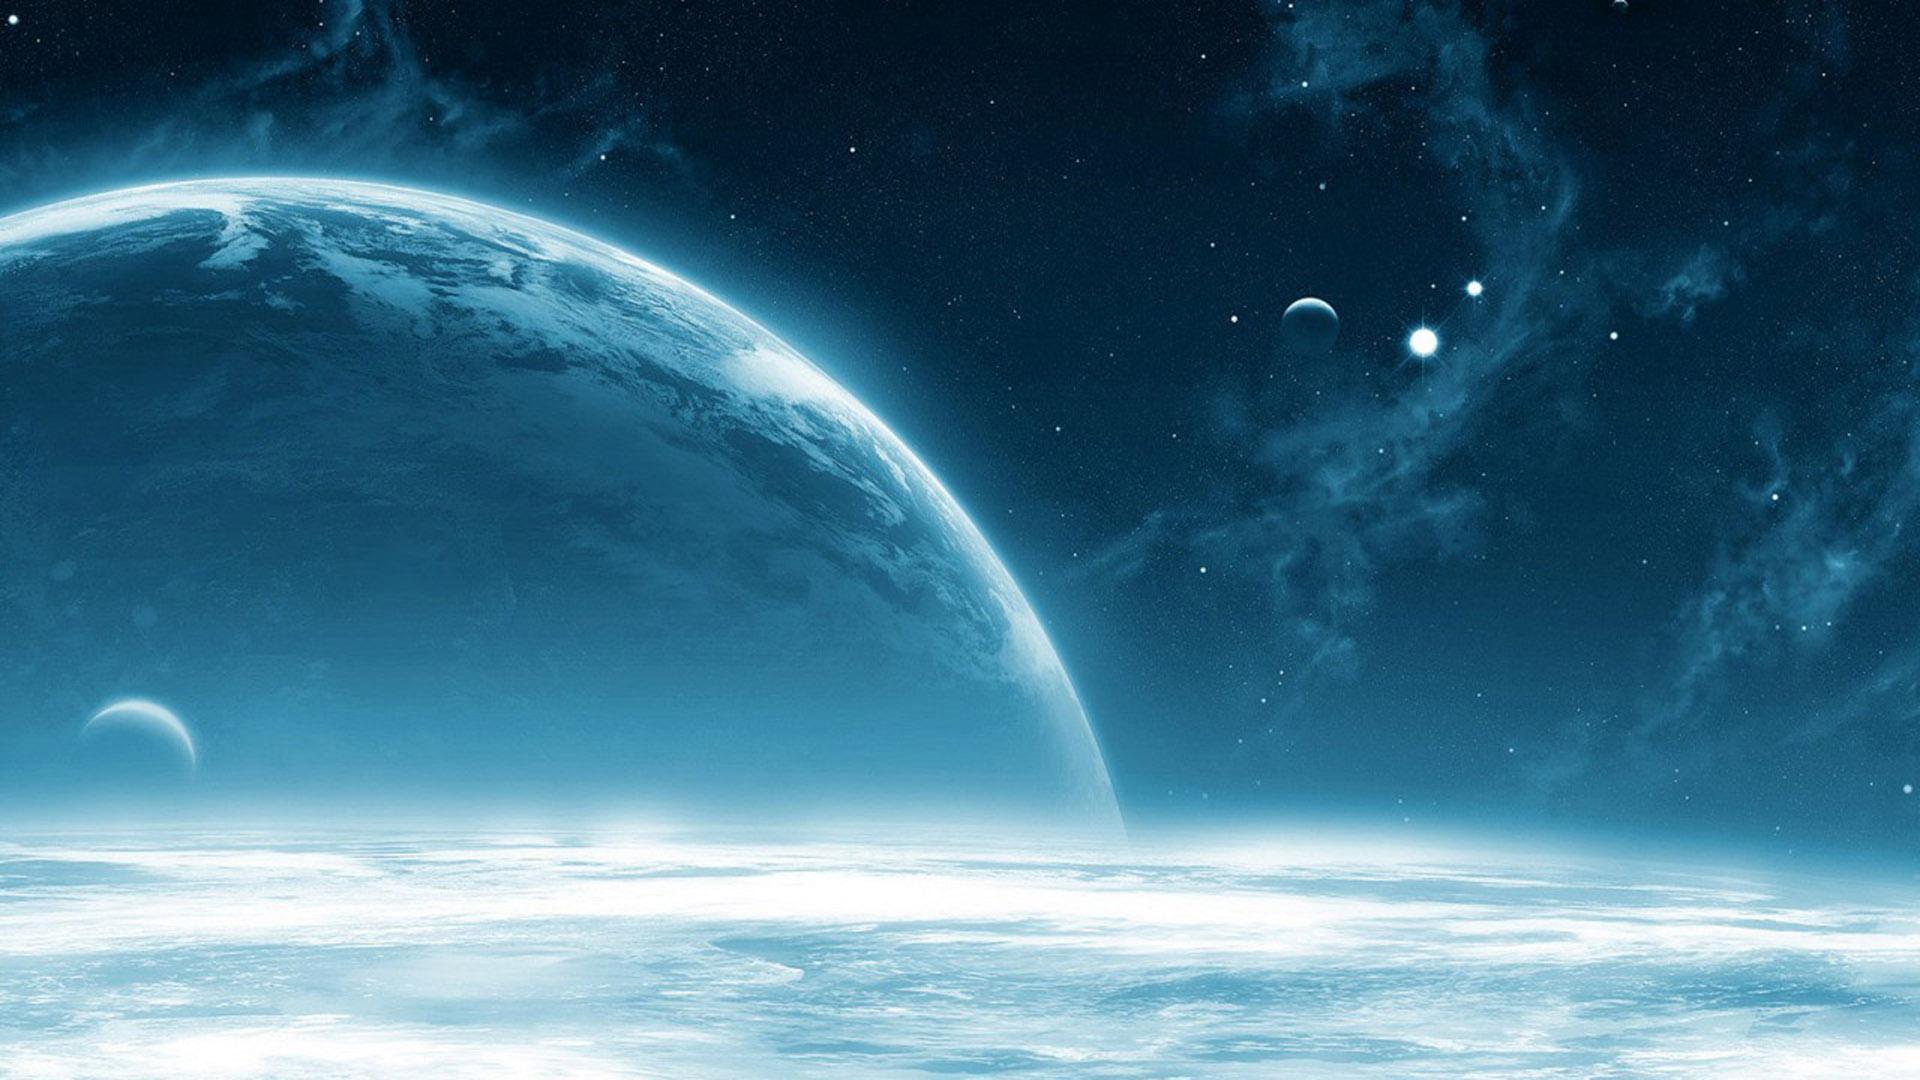 Space Desktop Background - Space Desktop , HD Wallpaper & Backgrounds